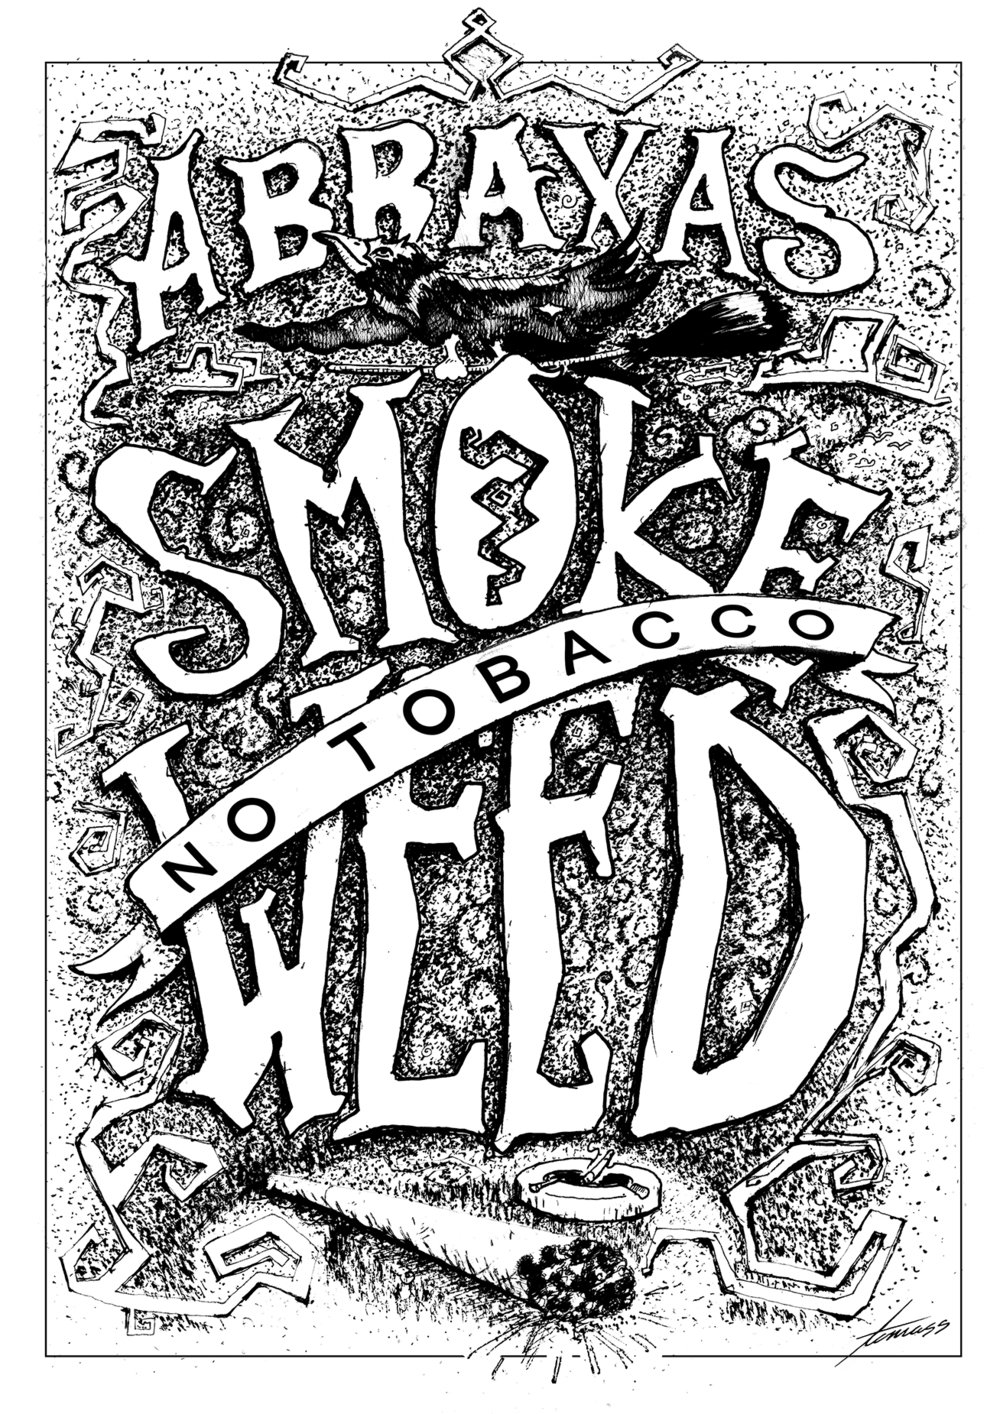 Smoke weed abraxas poster small.jpg